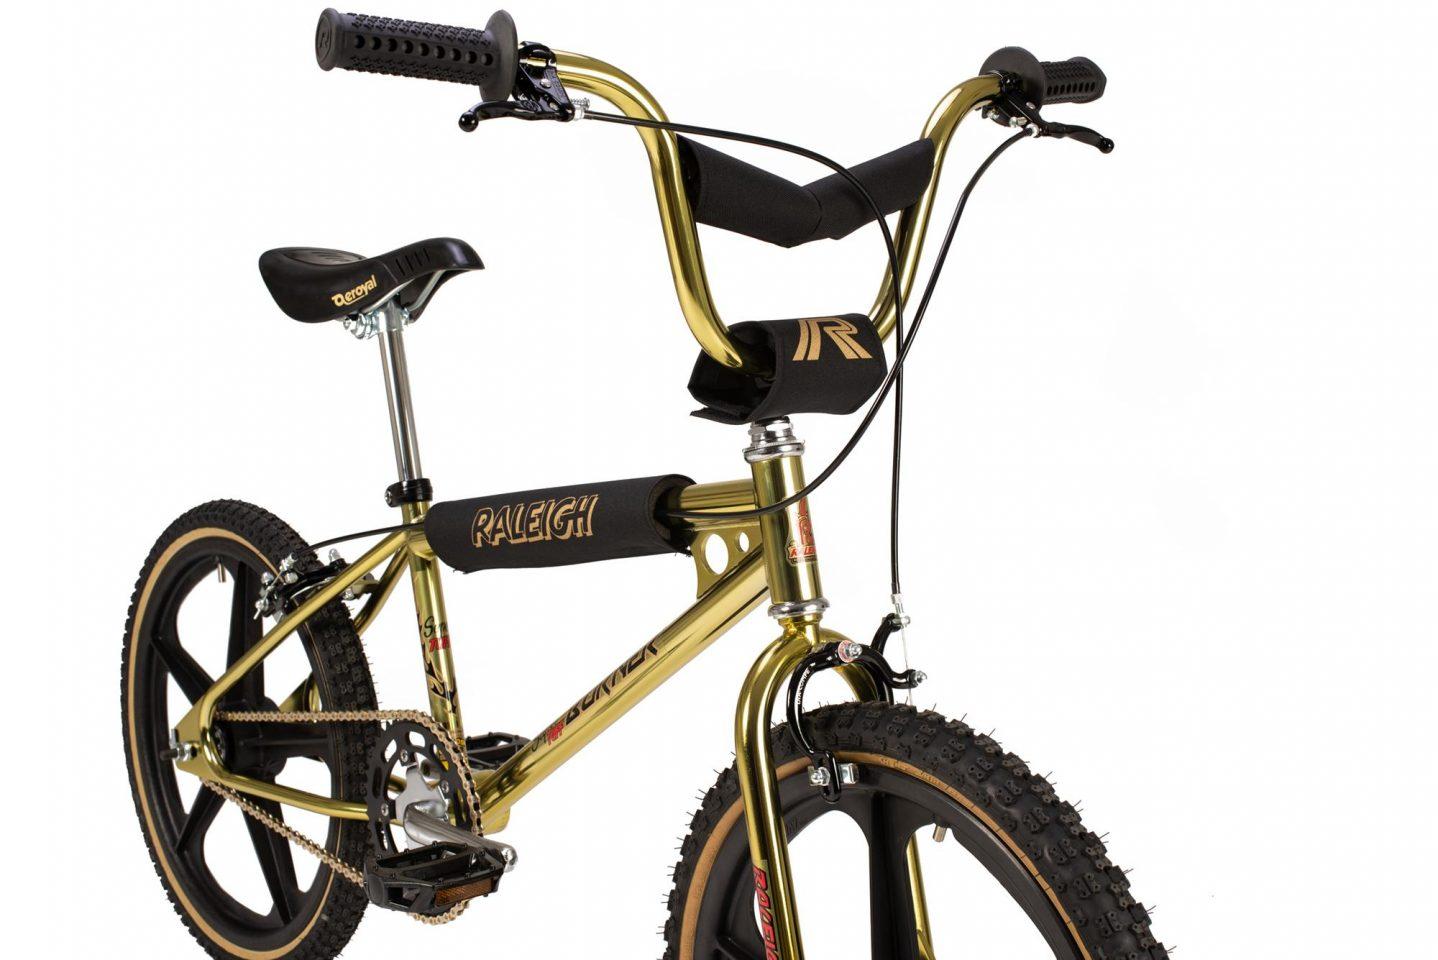 Raleigh Super Tuff Burner bmx bike